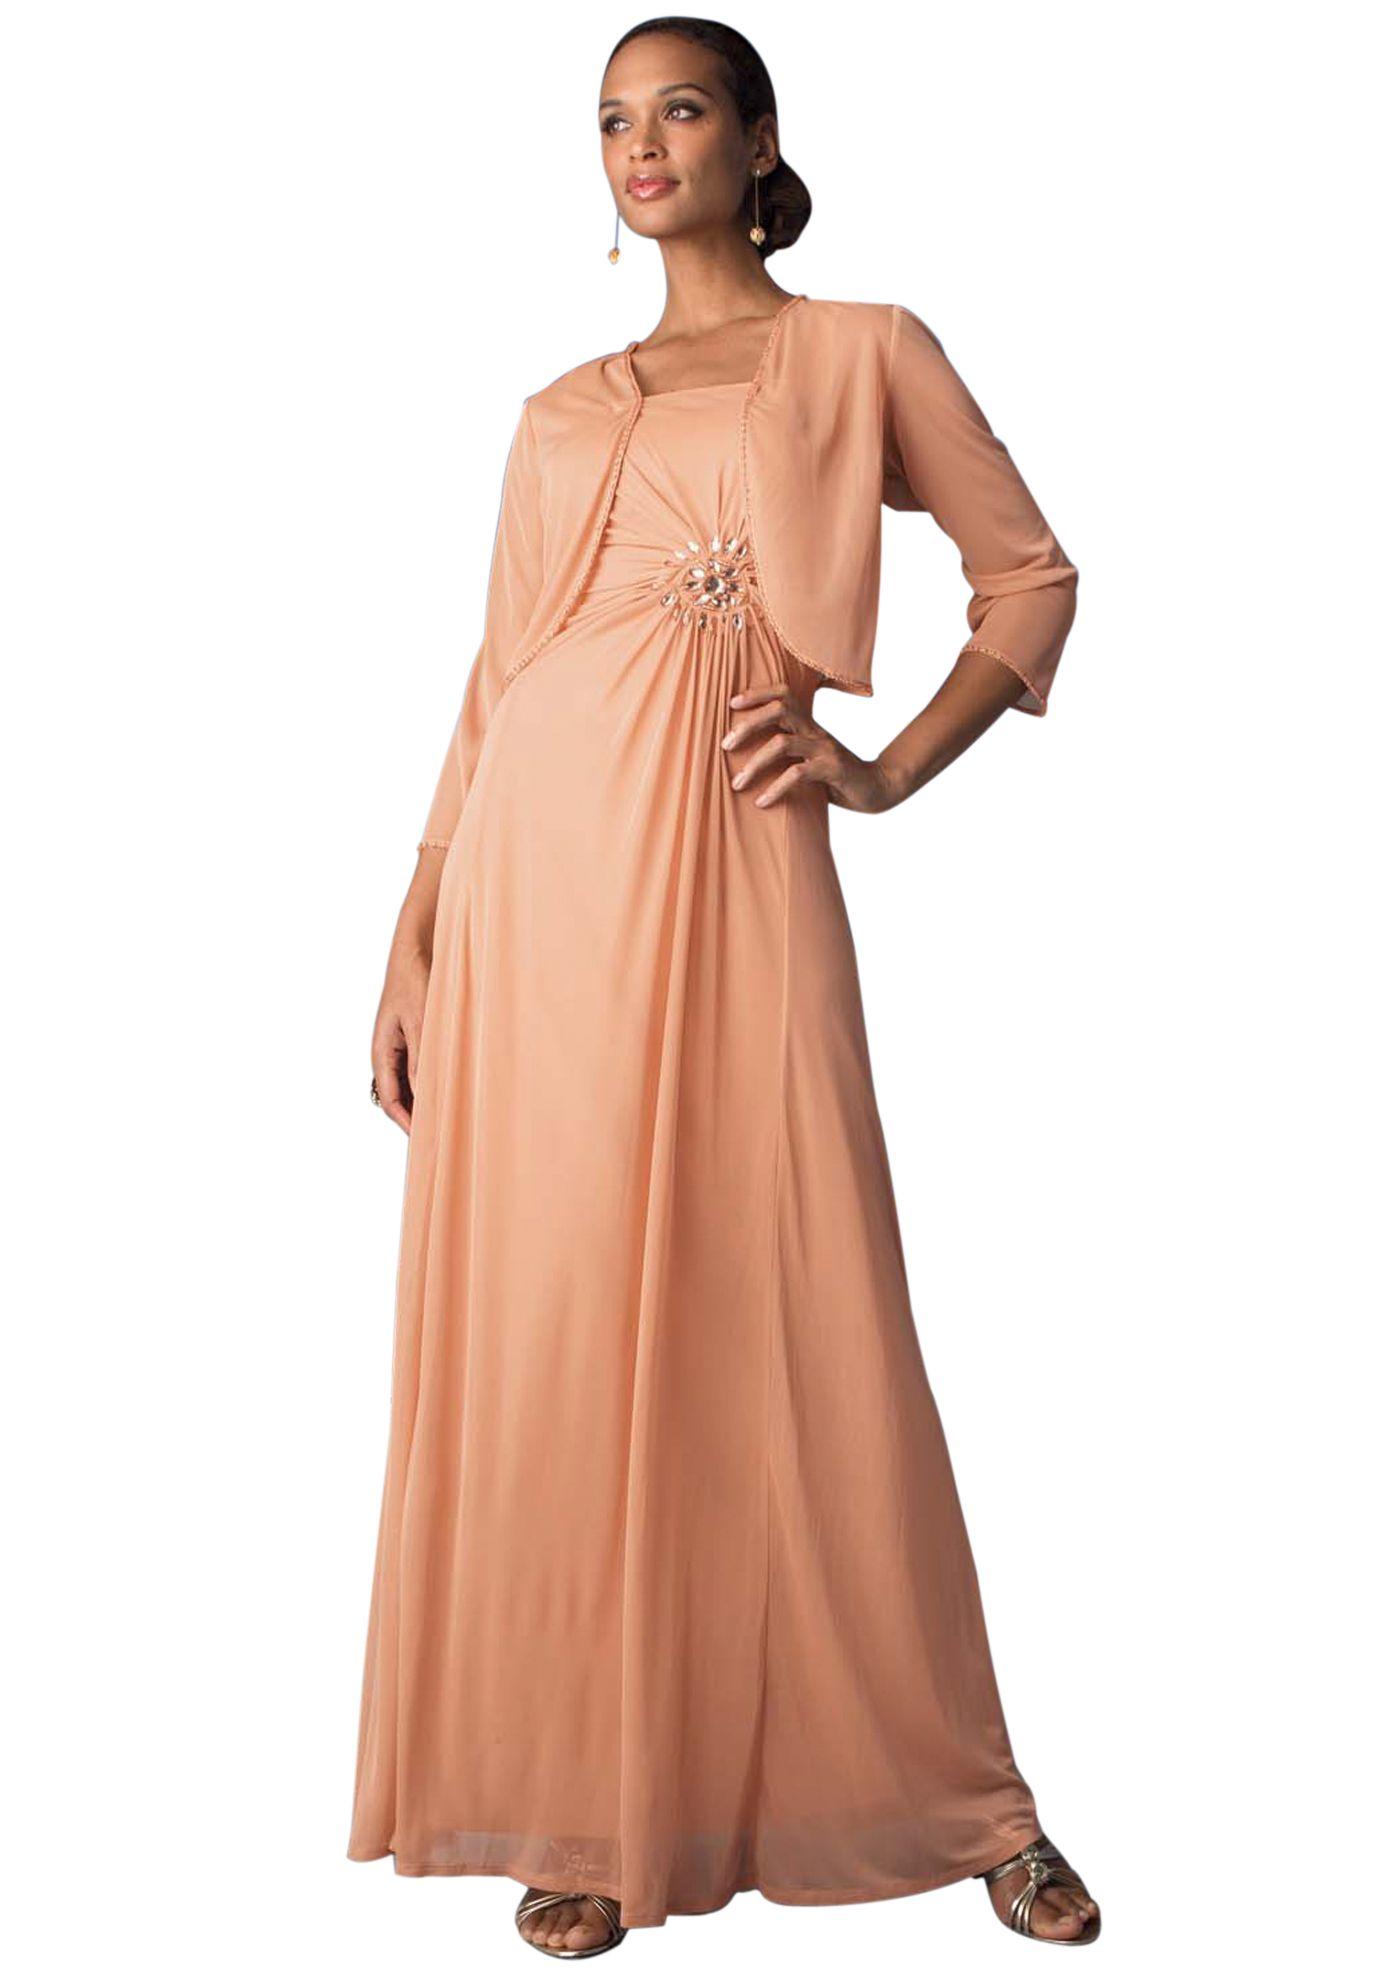 Gathered Bolero Dress Plus Size Dresses Jessica London Grown